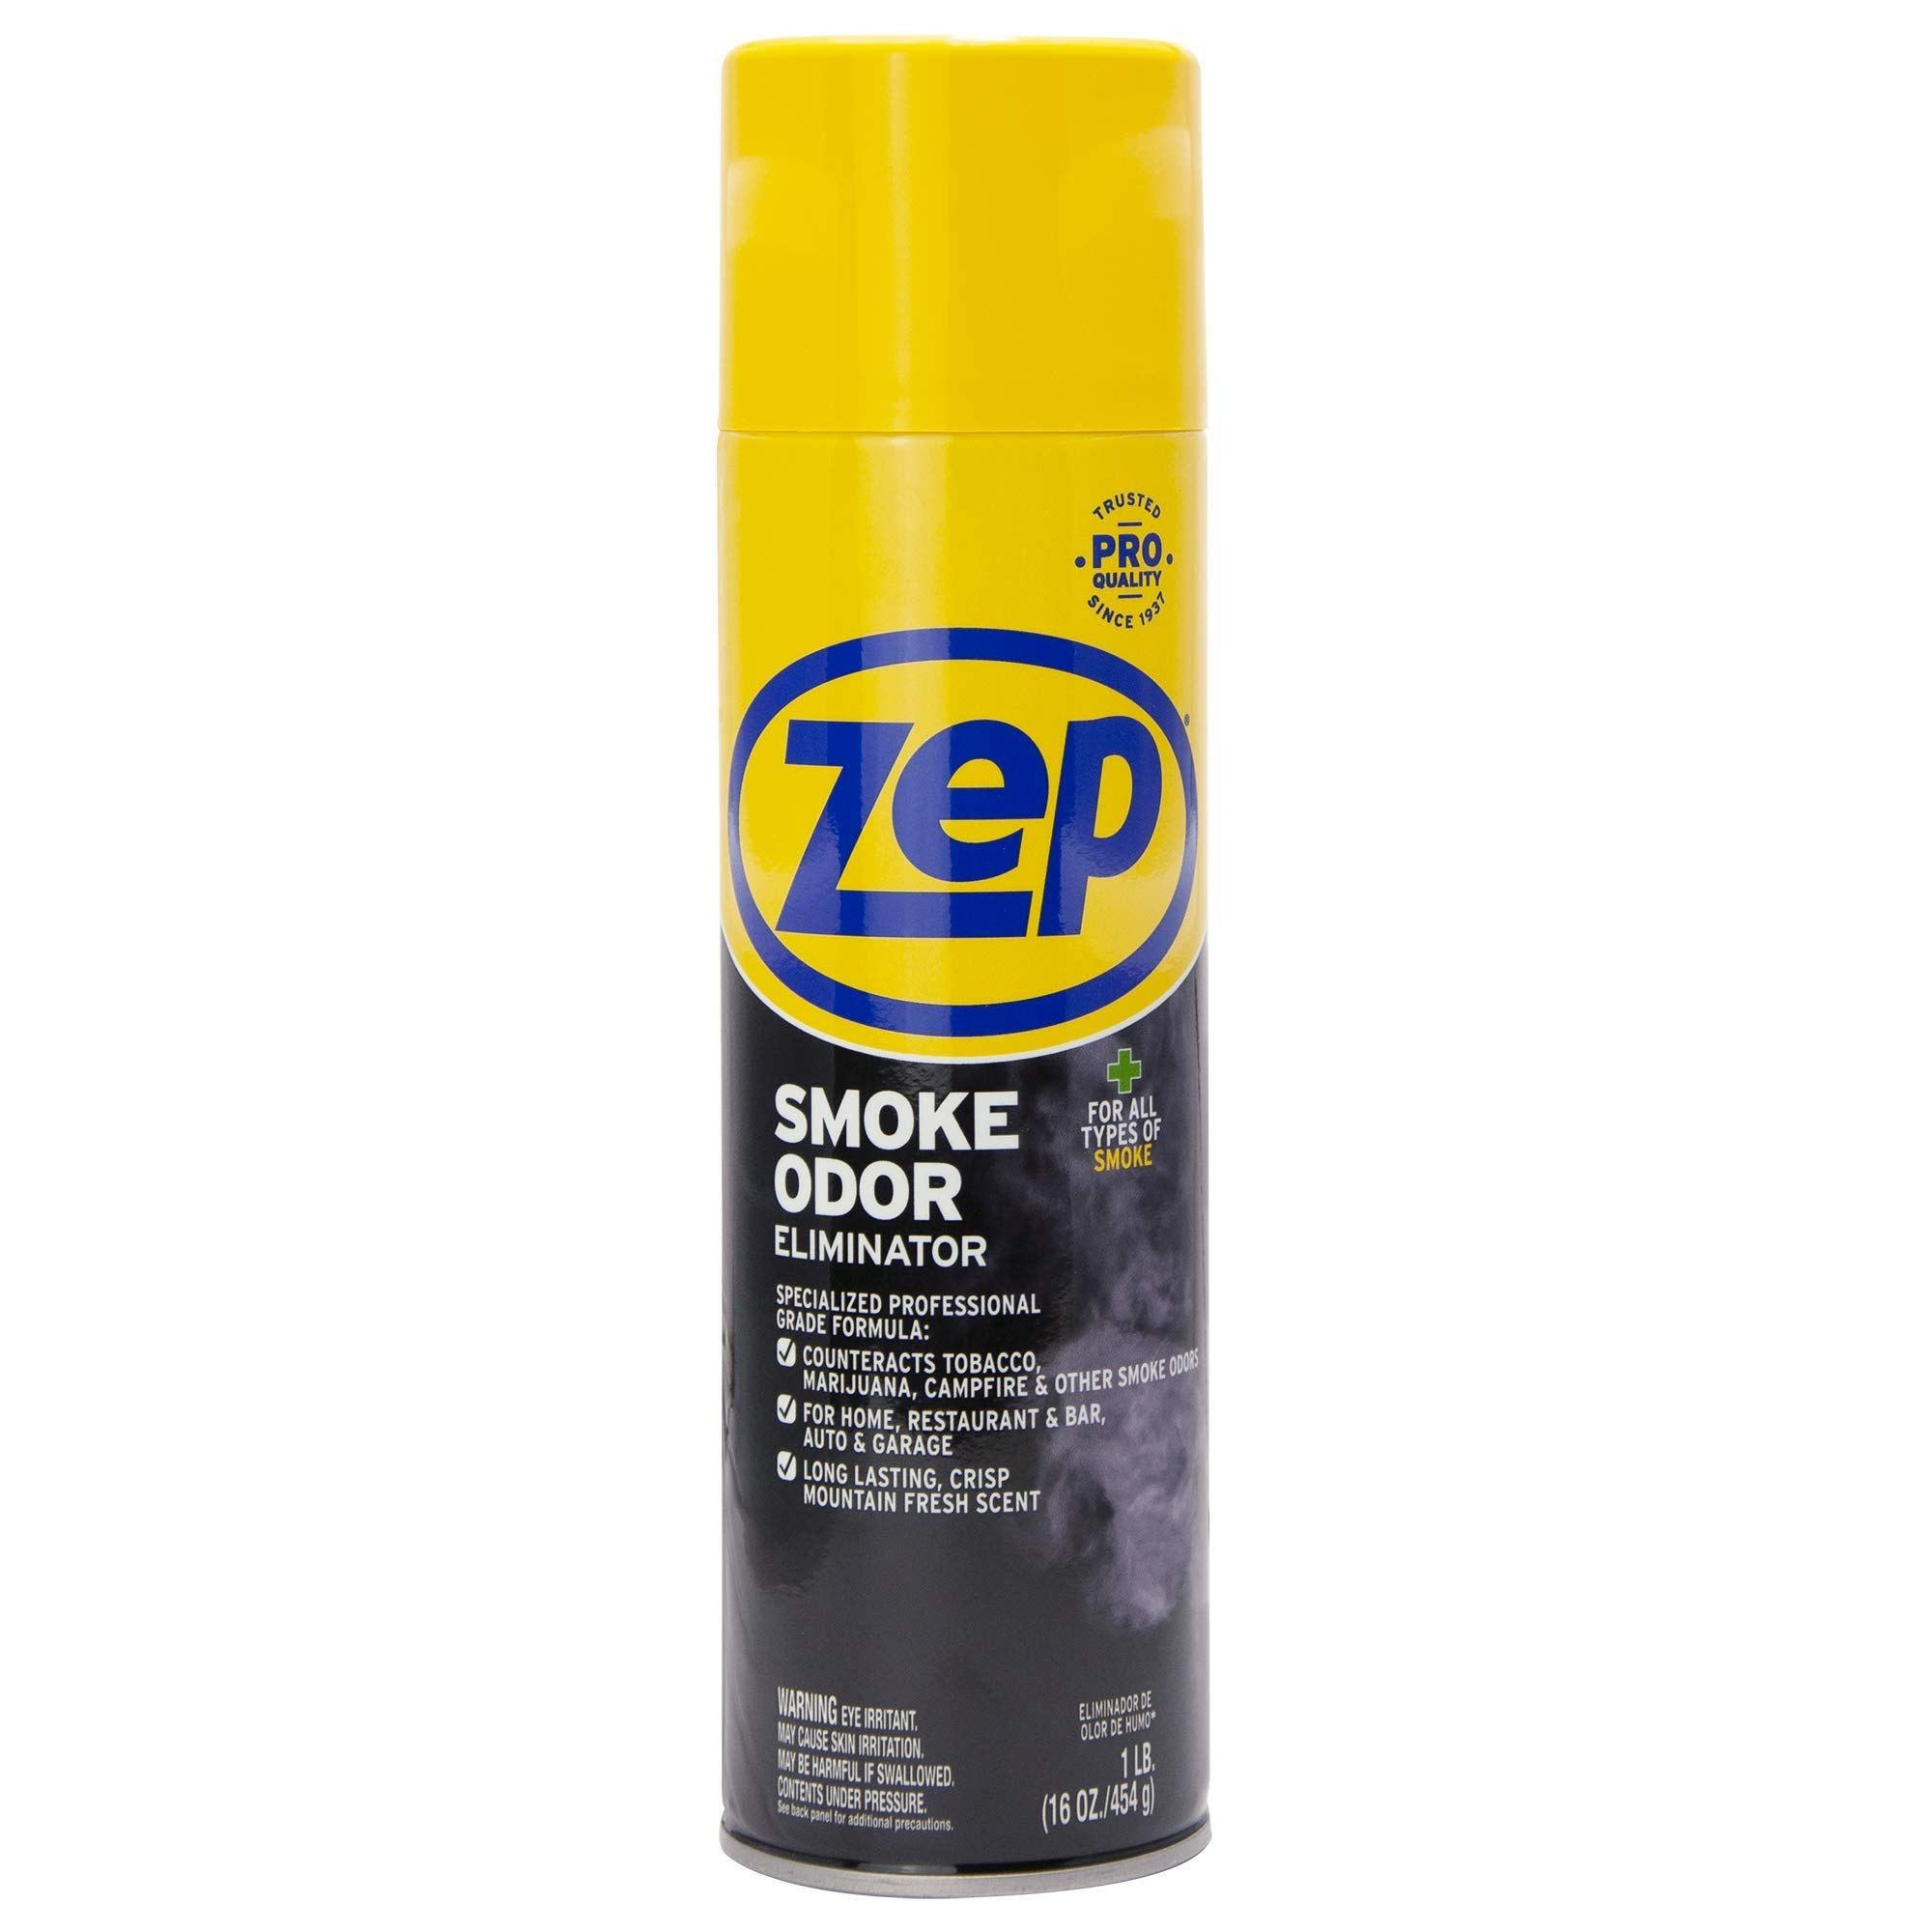 Zep Smoke Odor Eliminator 16 Ounces Zusoe16 Smoke Odor Eliminator Odor Eliminator Freshener Spray